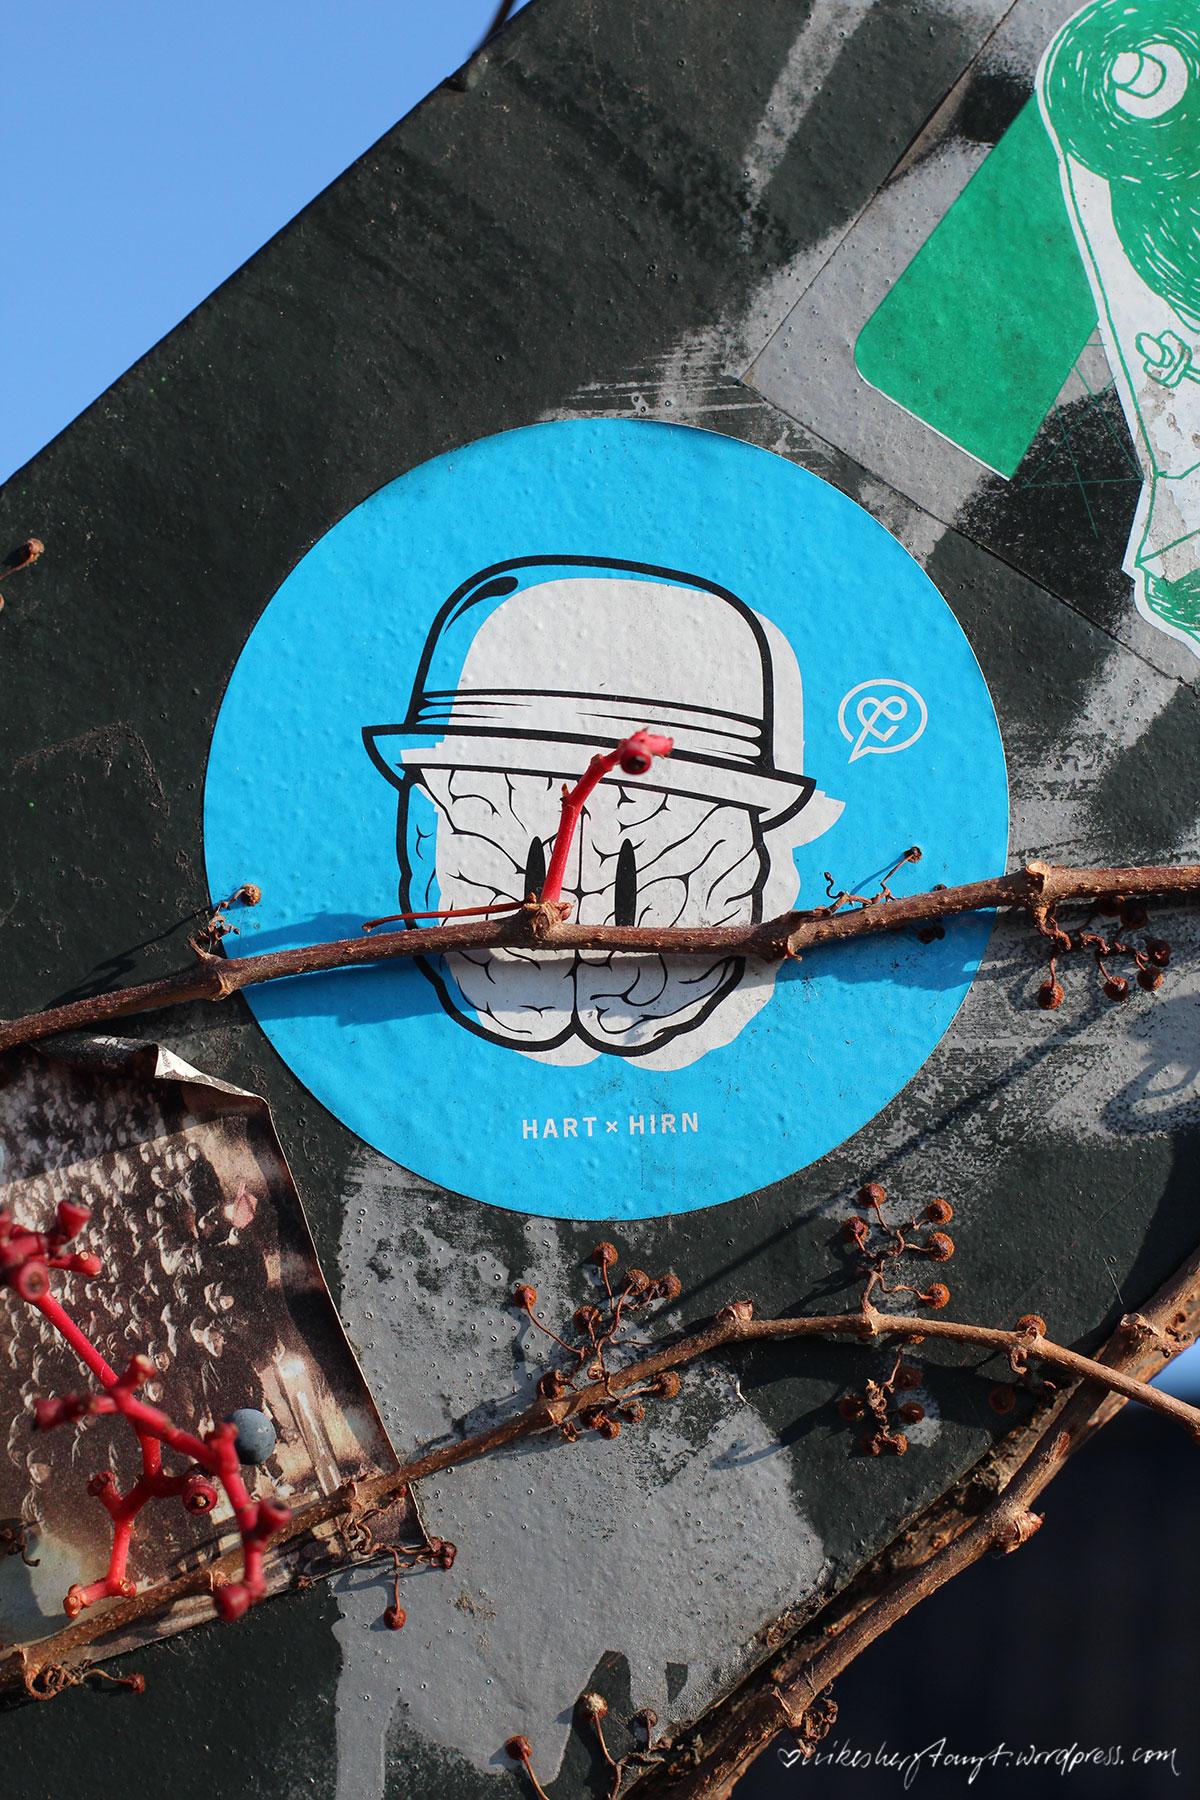 hamburg, st pauli, street art, nikesherztanzt,